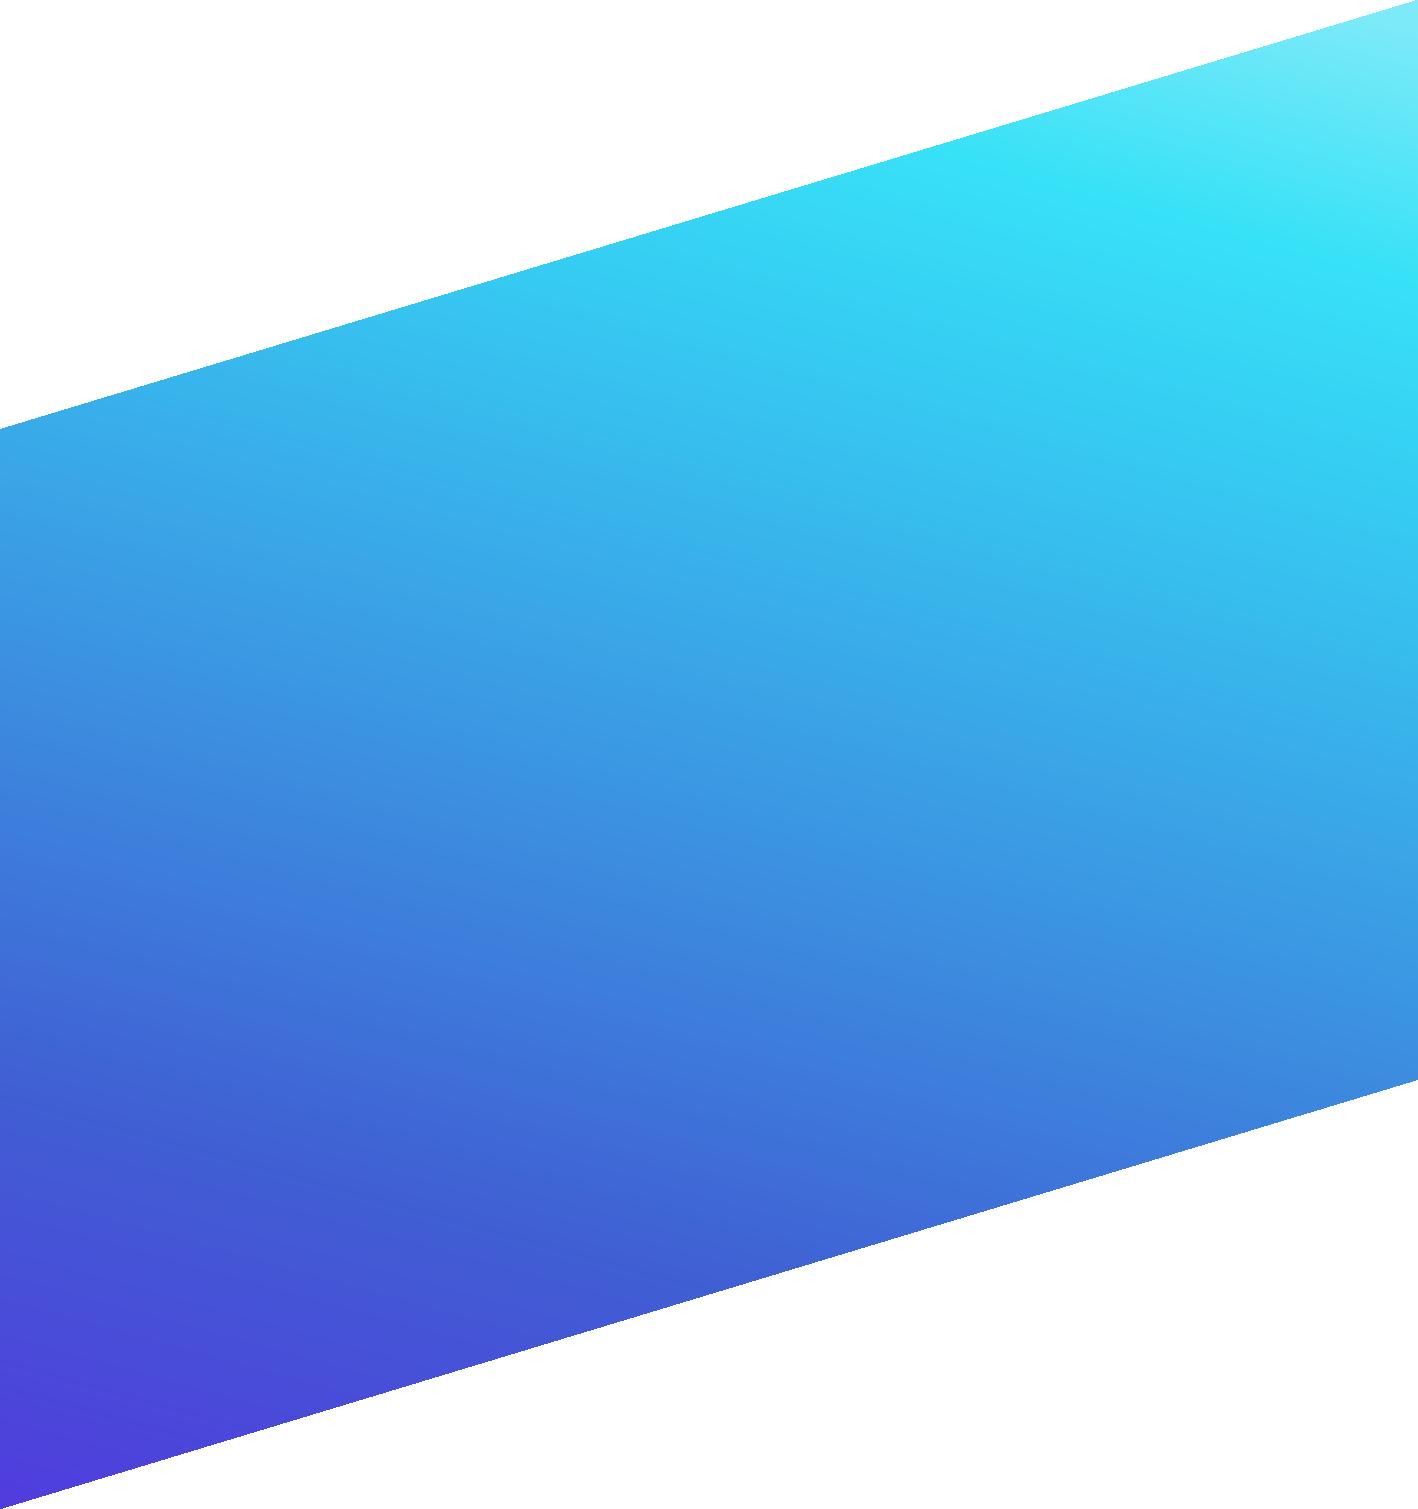 blue bck.png